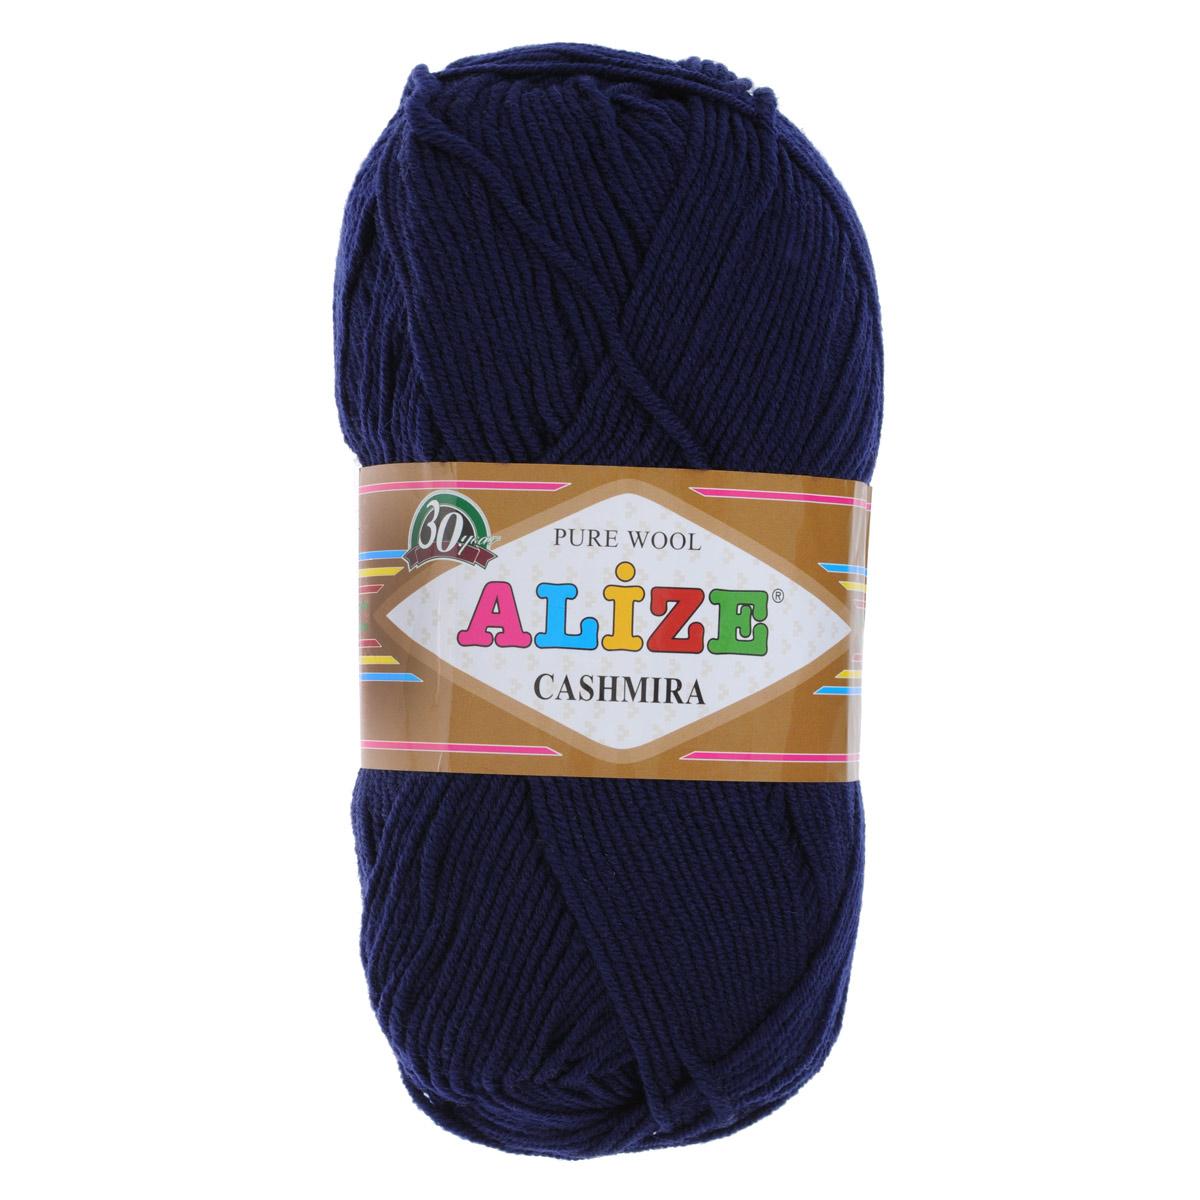 Пряжа для вязания Alize Cashmira, цвет: синий (58), 300 м, 100 г, 5 шт цена